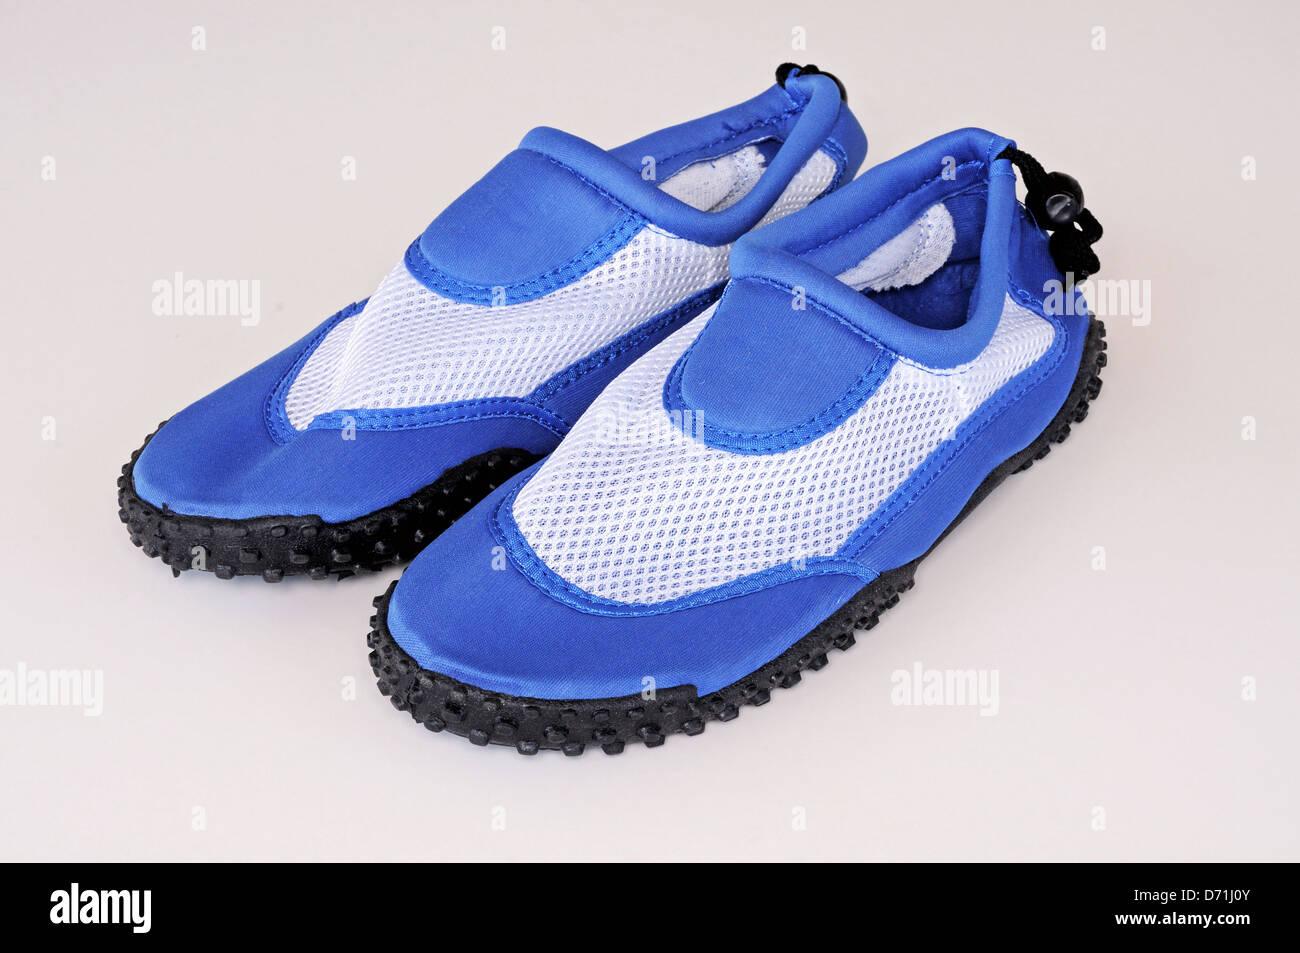 Gents blue beach shoes against a plain background. - Stock Image